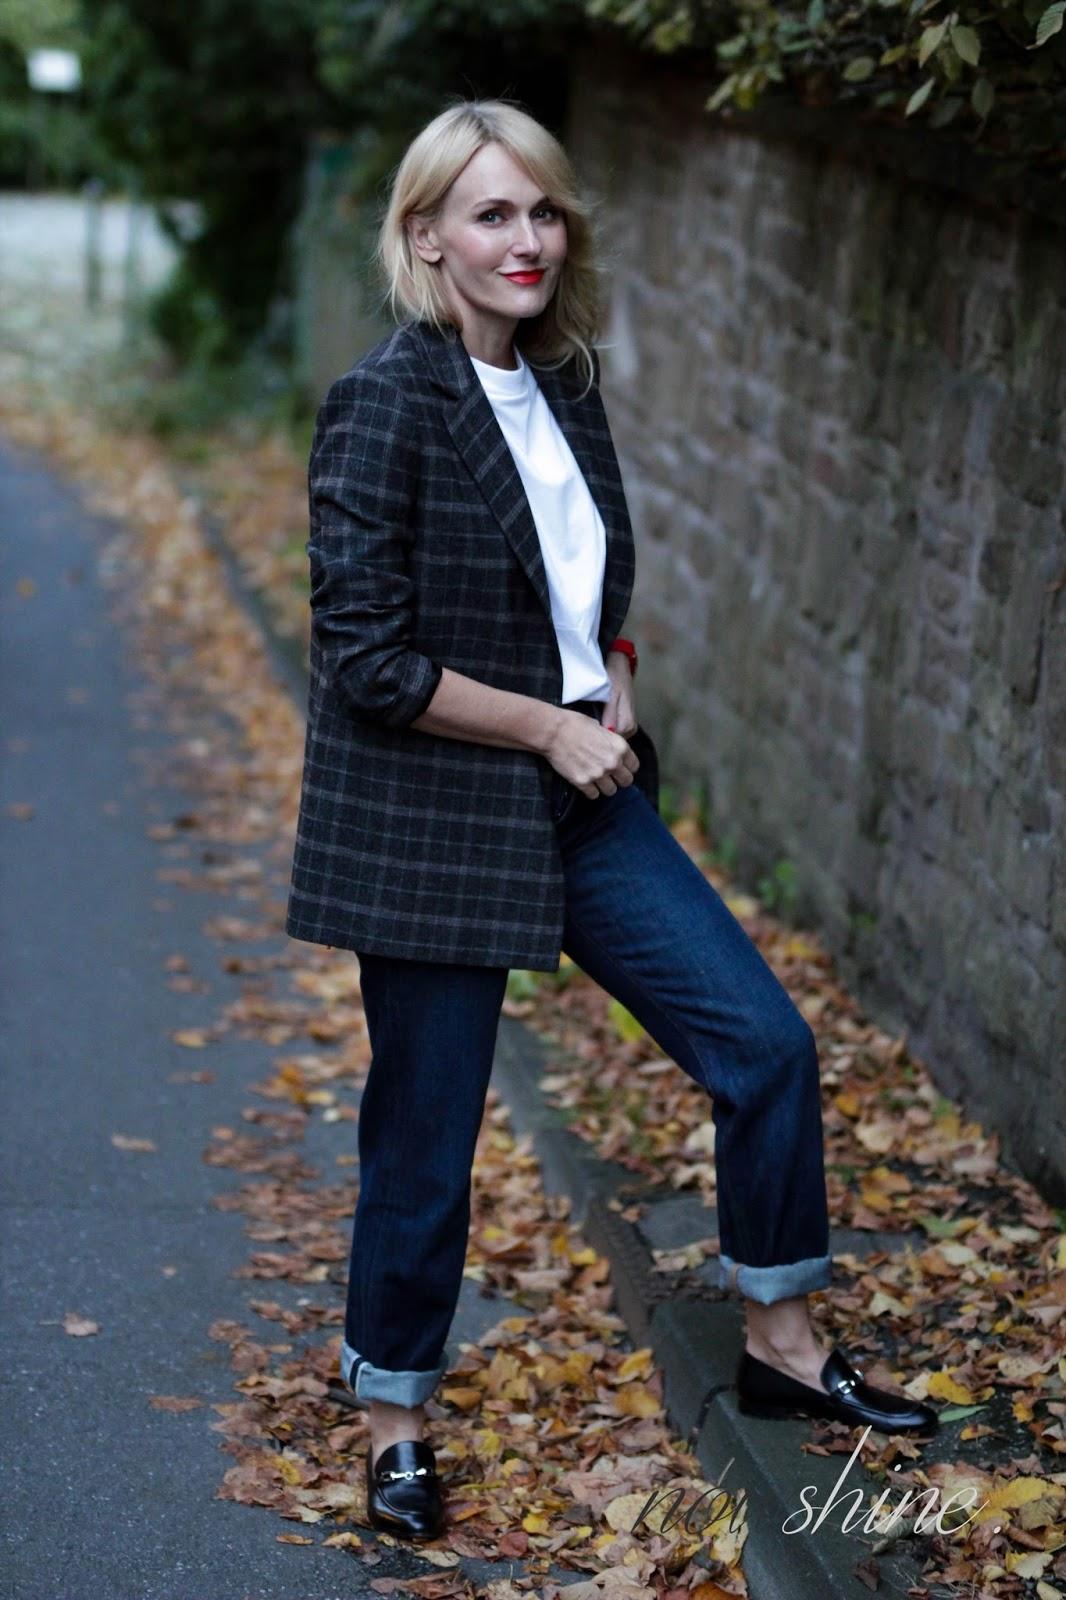 Fashionblog über 40